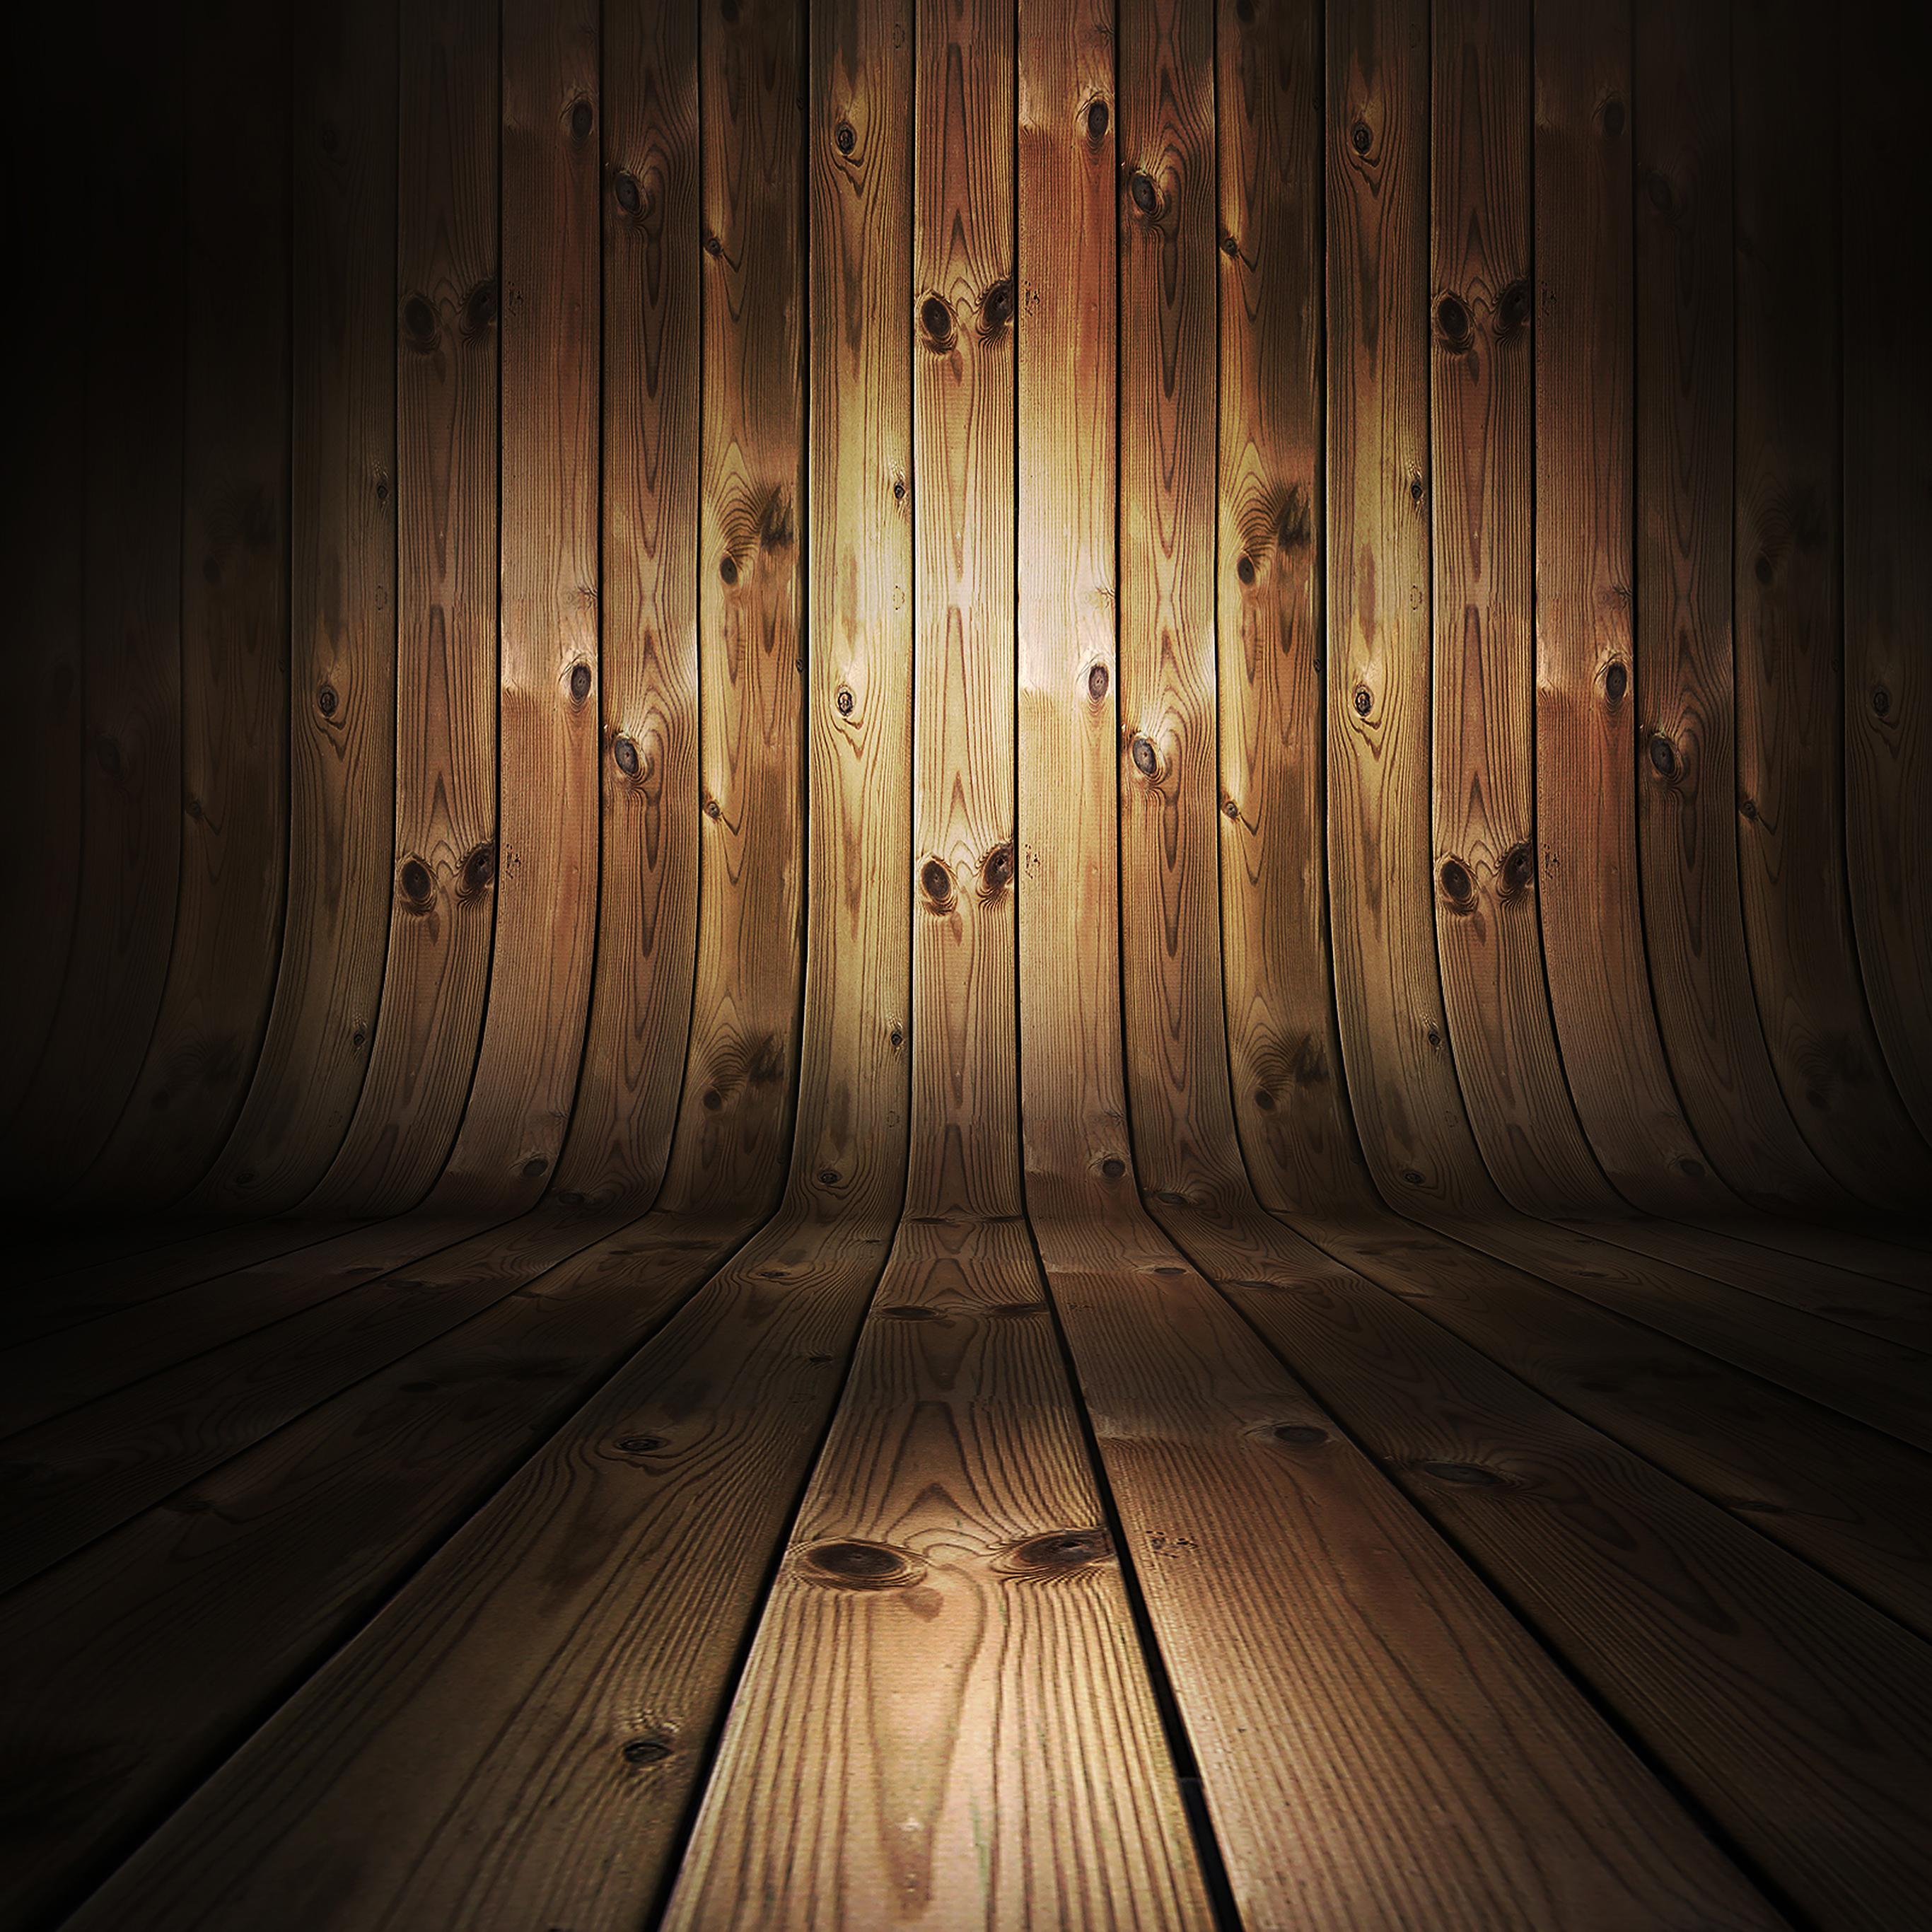 Ae14 Dark Bent Wood Background Wallpaper